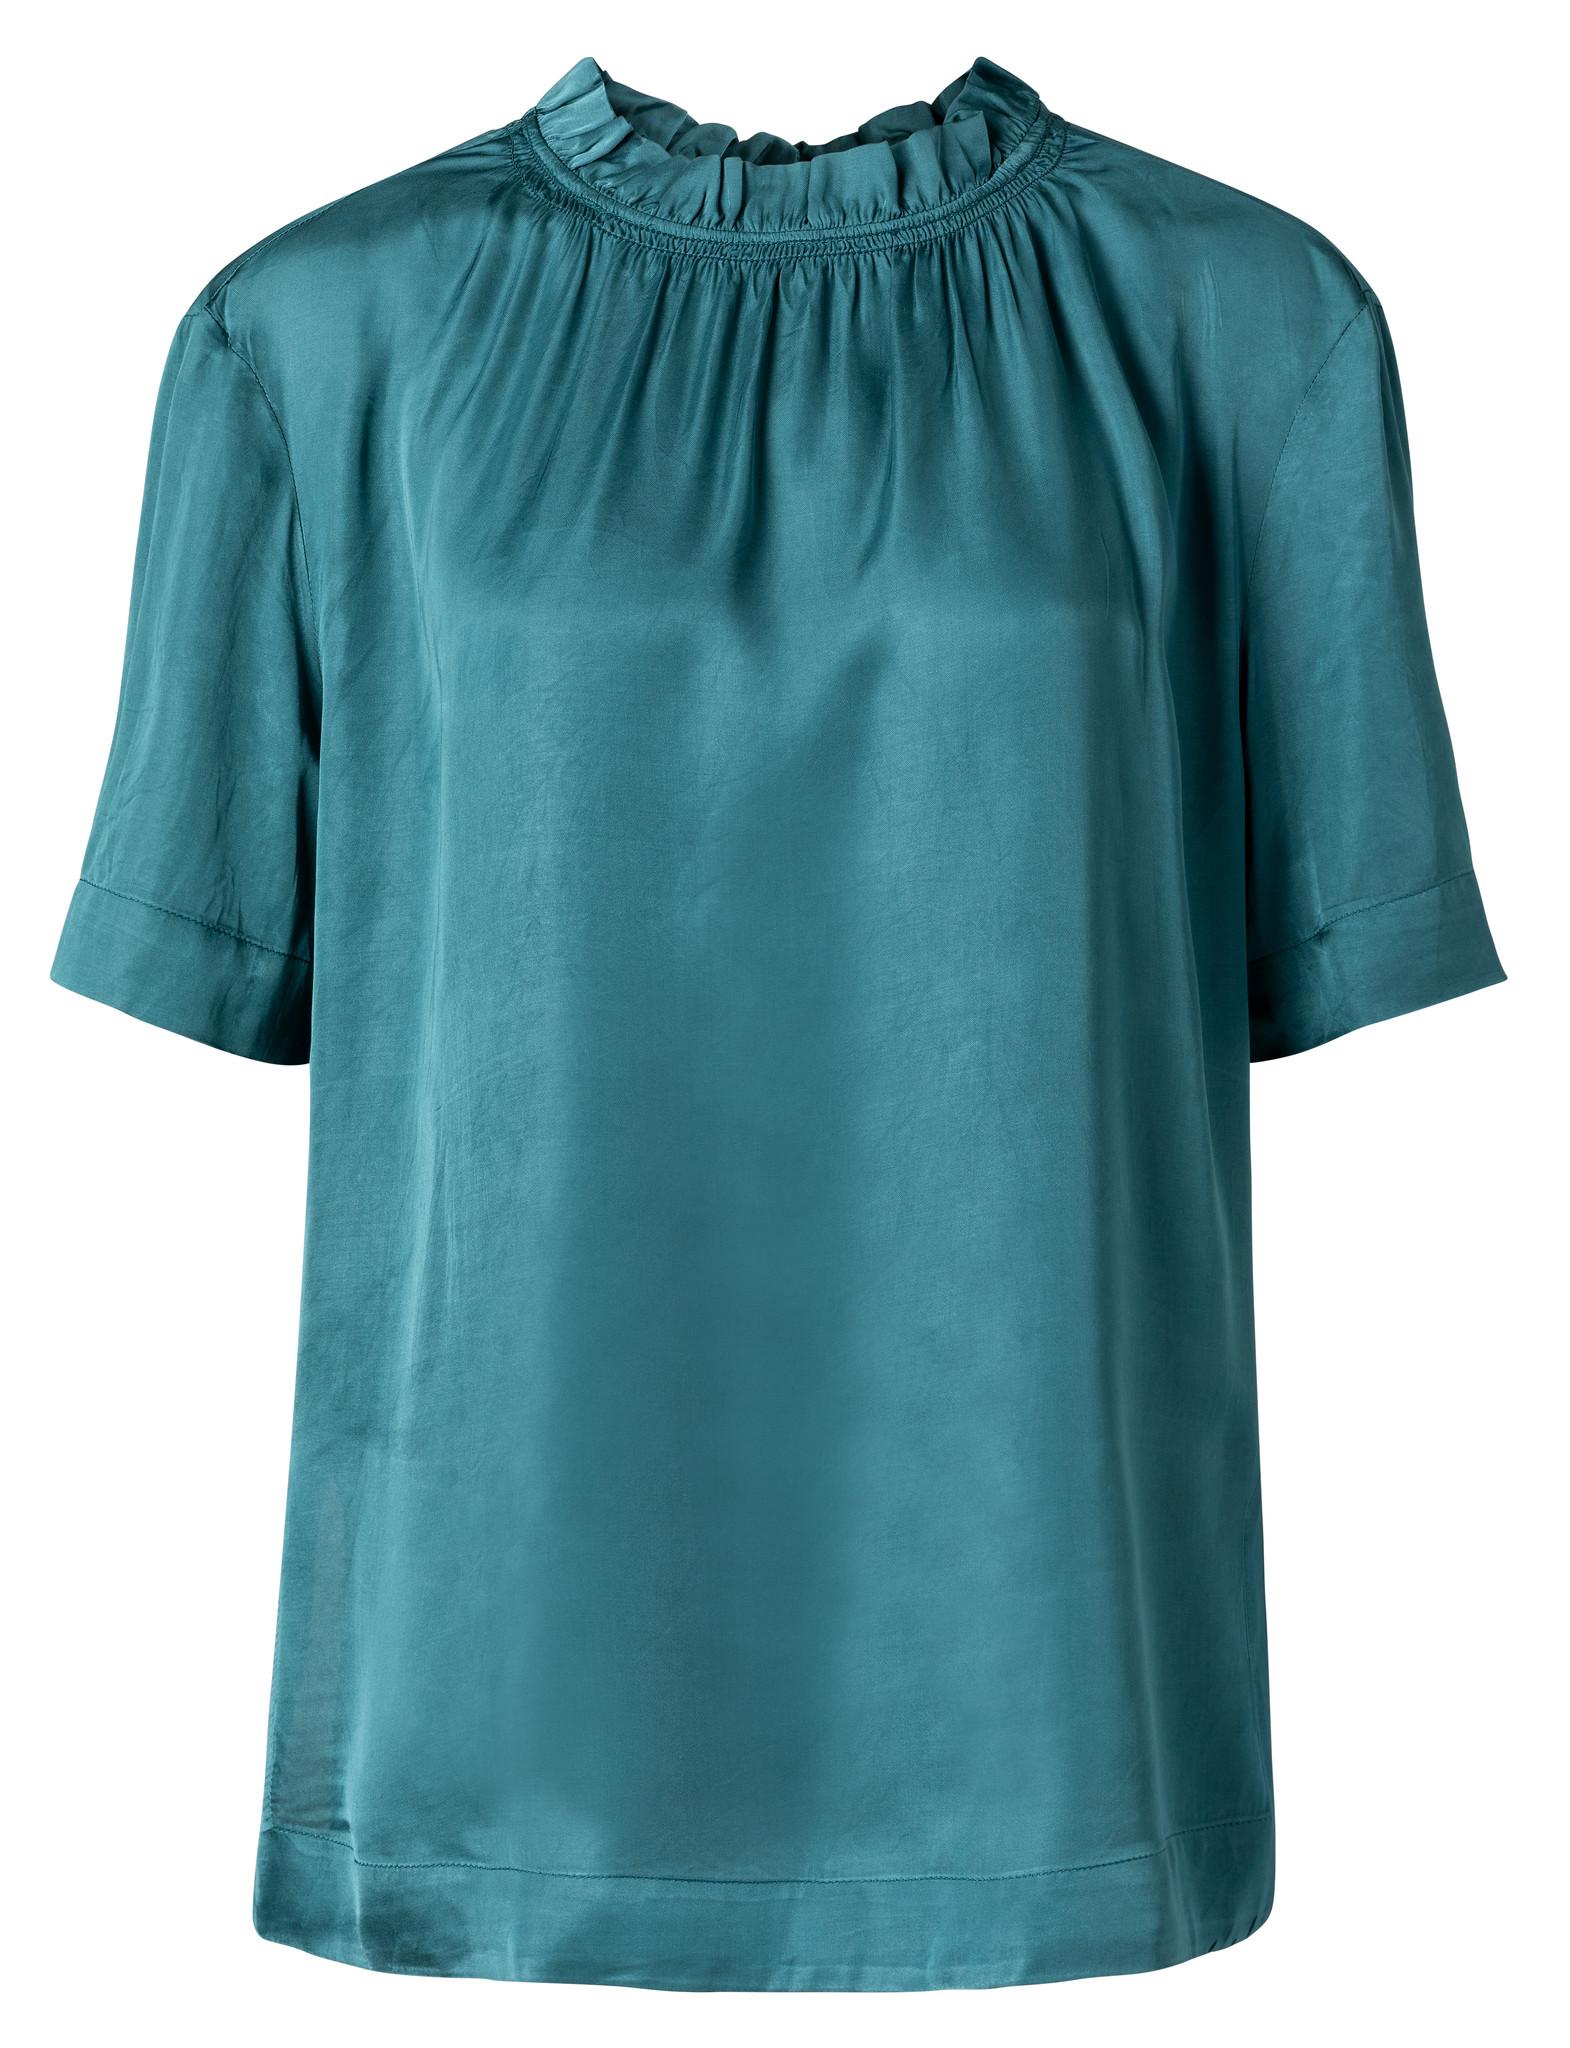 yaya Smocked neckline top 1901393-112-1